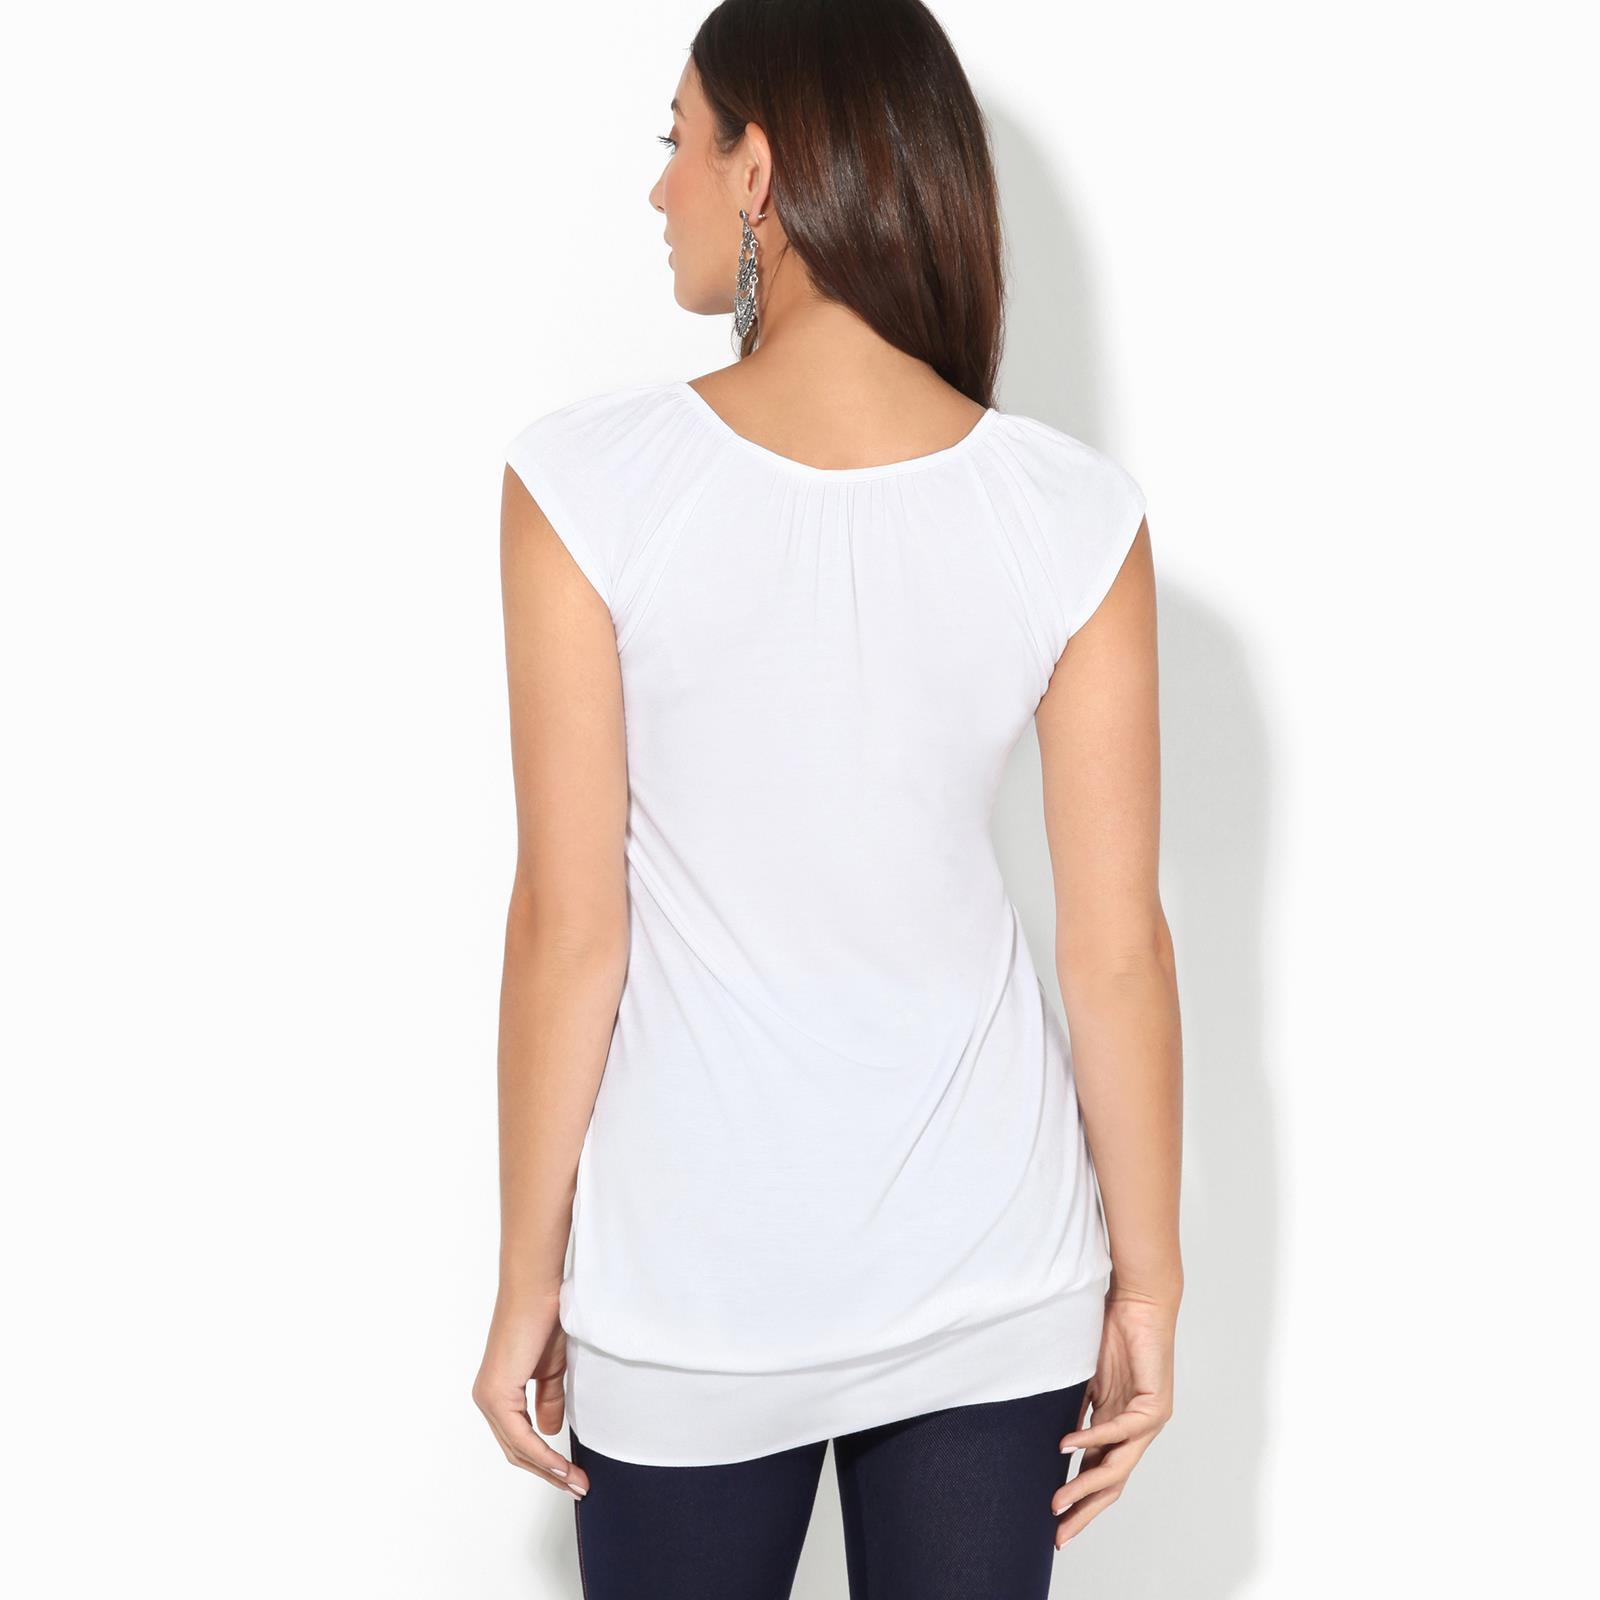 Womens-Ladies-Scoop-Neck-Blouse-V-T-Shirt-Long-Short-Sleeve-Plain-Loose-Top thumbnail 51